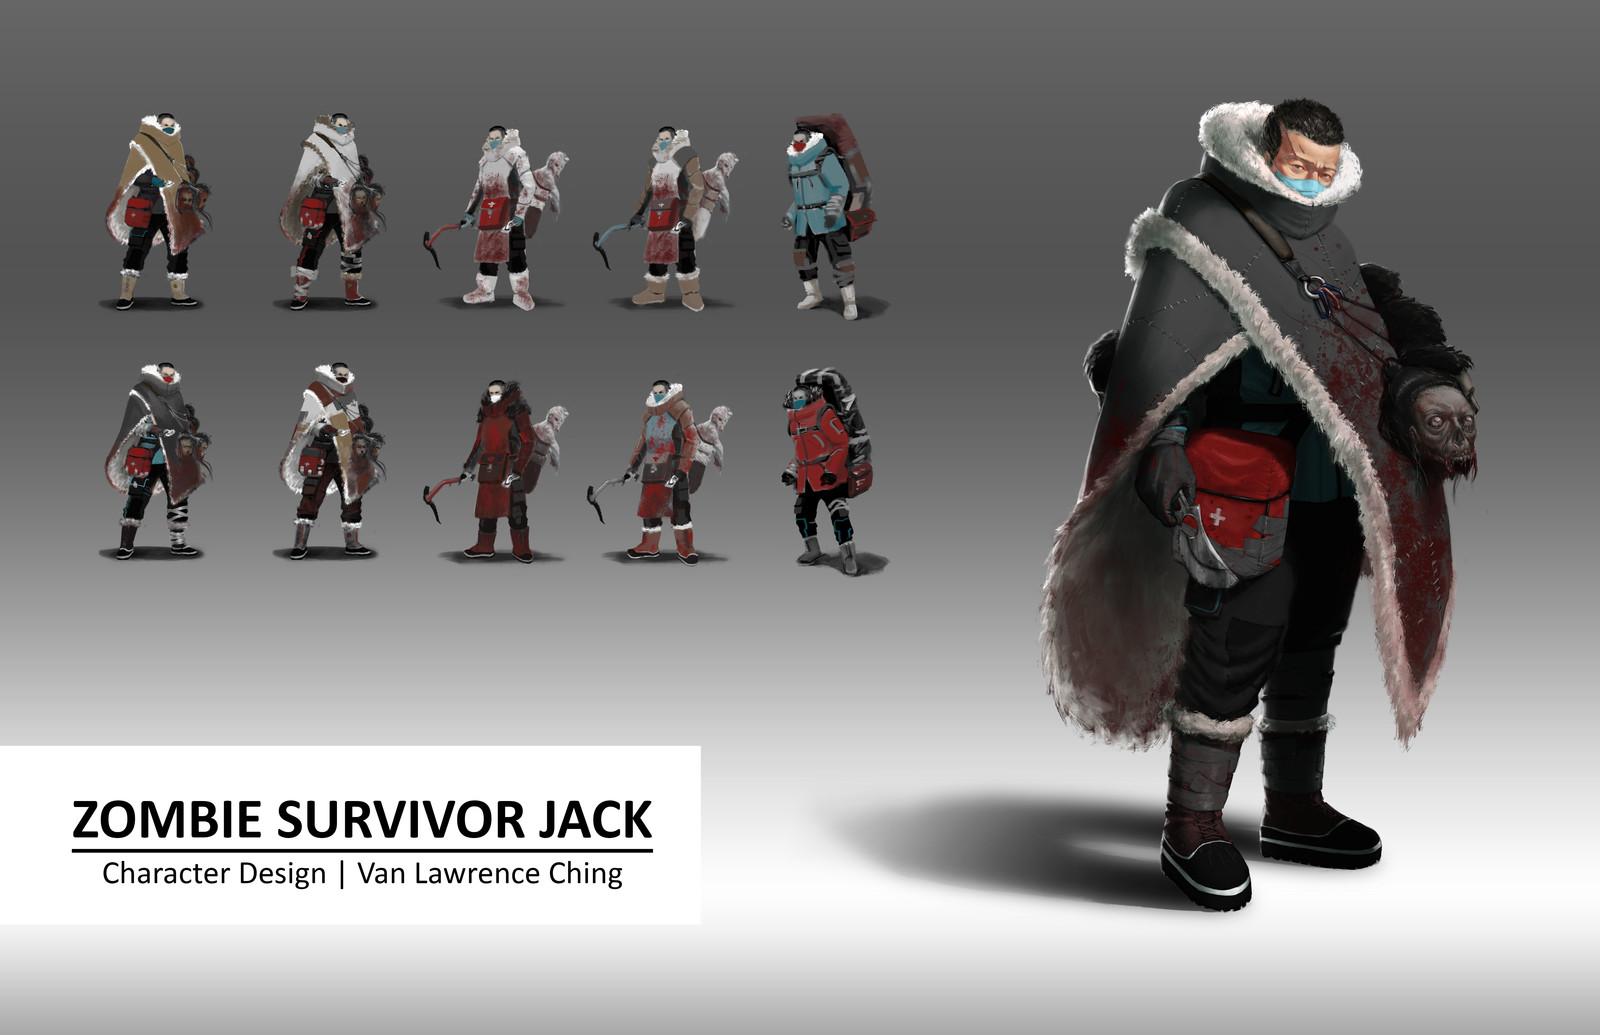 Zombie Survivor Jack